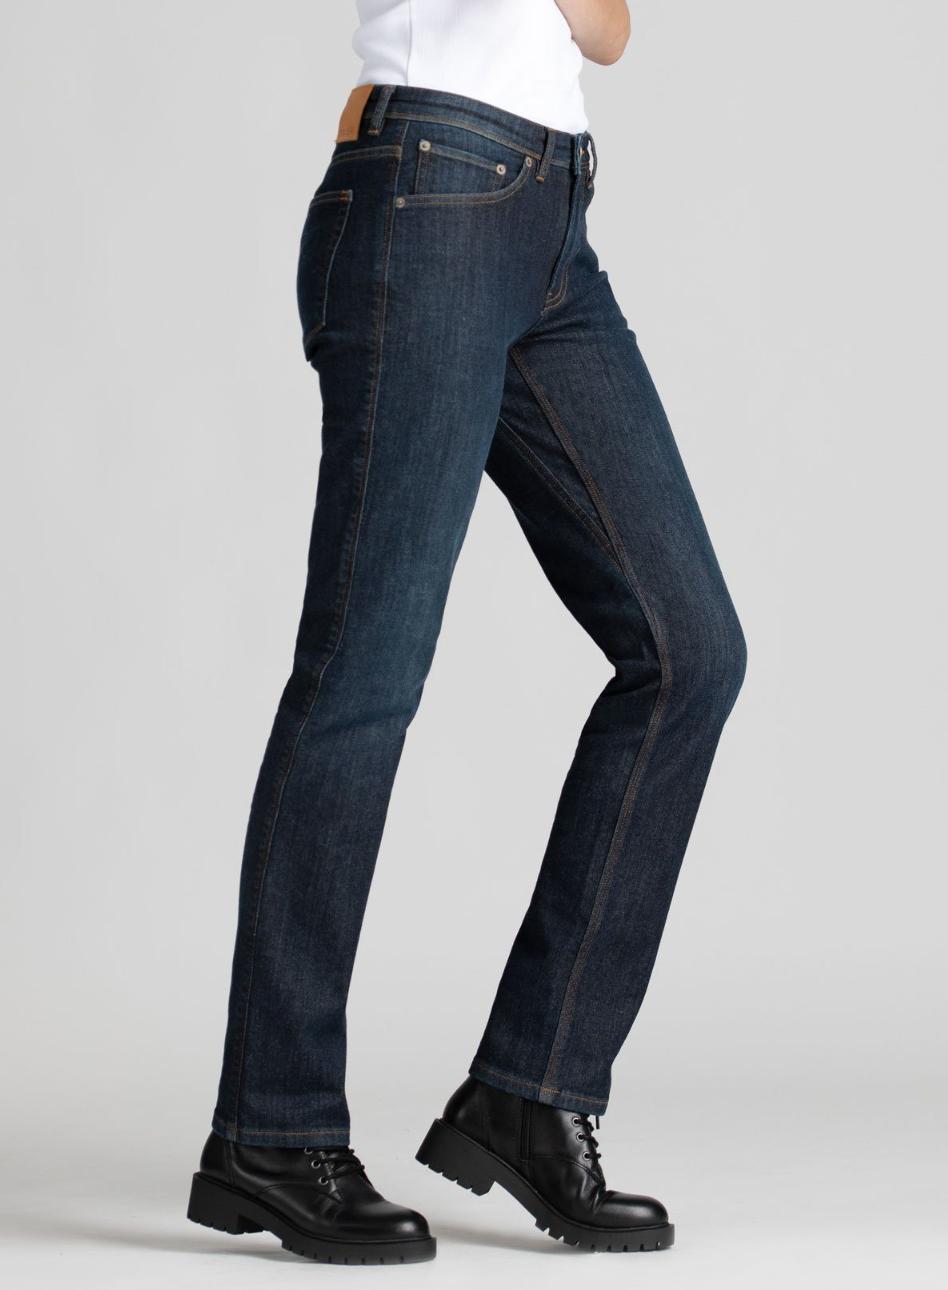 fleece-lined-pants-duer